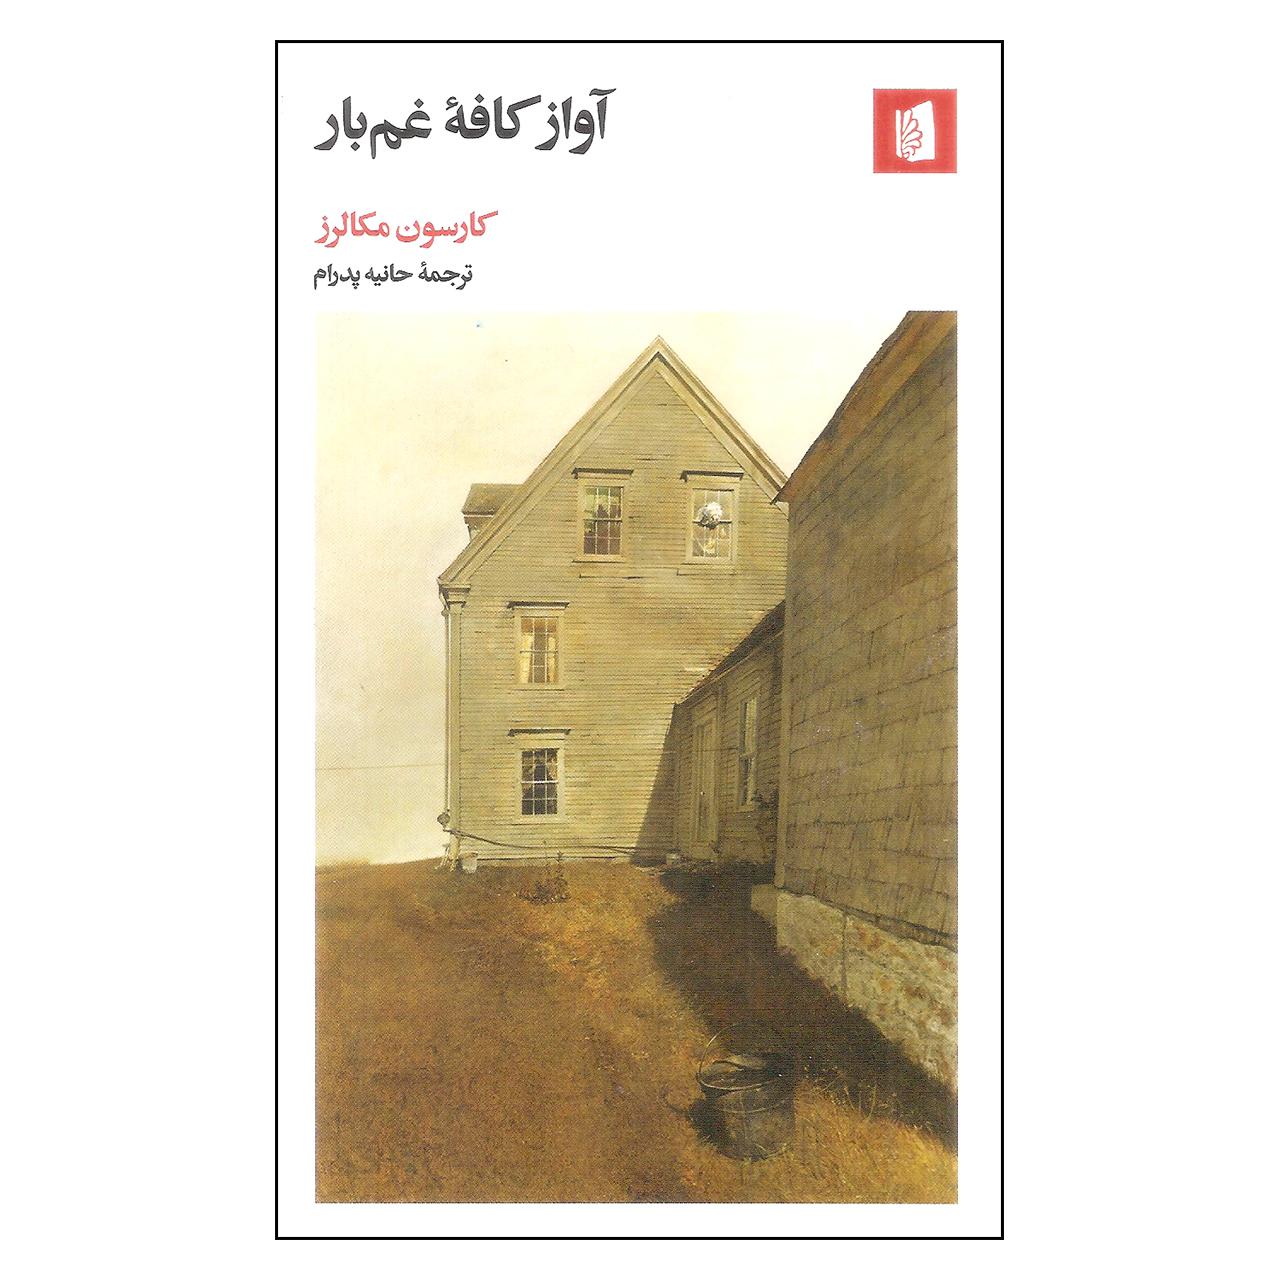 کتاب آواز کافه غم بار اثر کارسون مکالرز نشر بیدگل